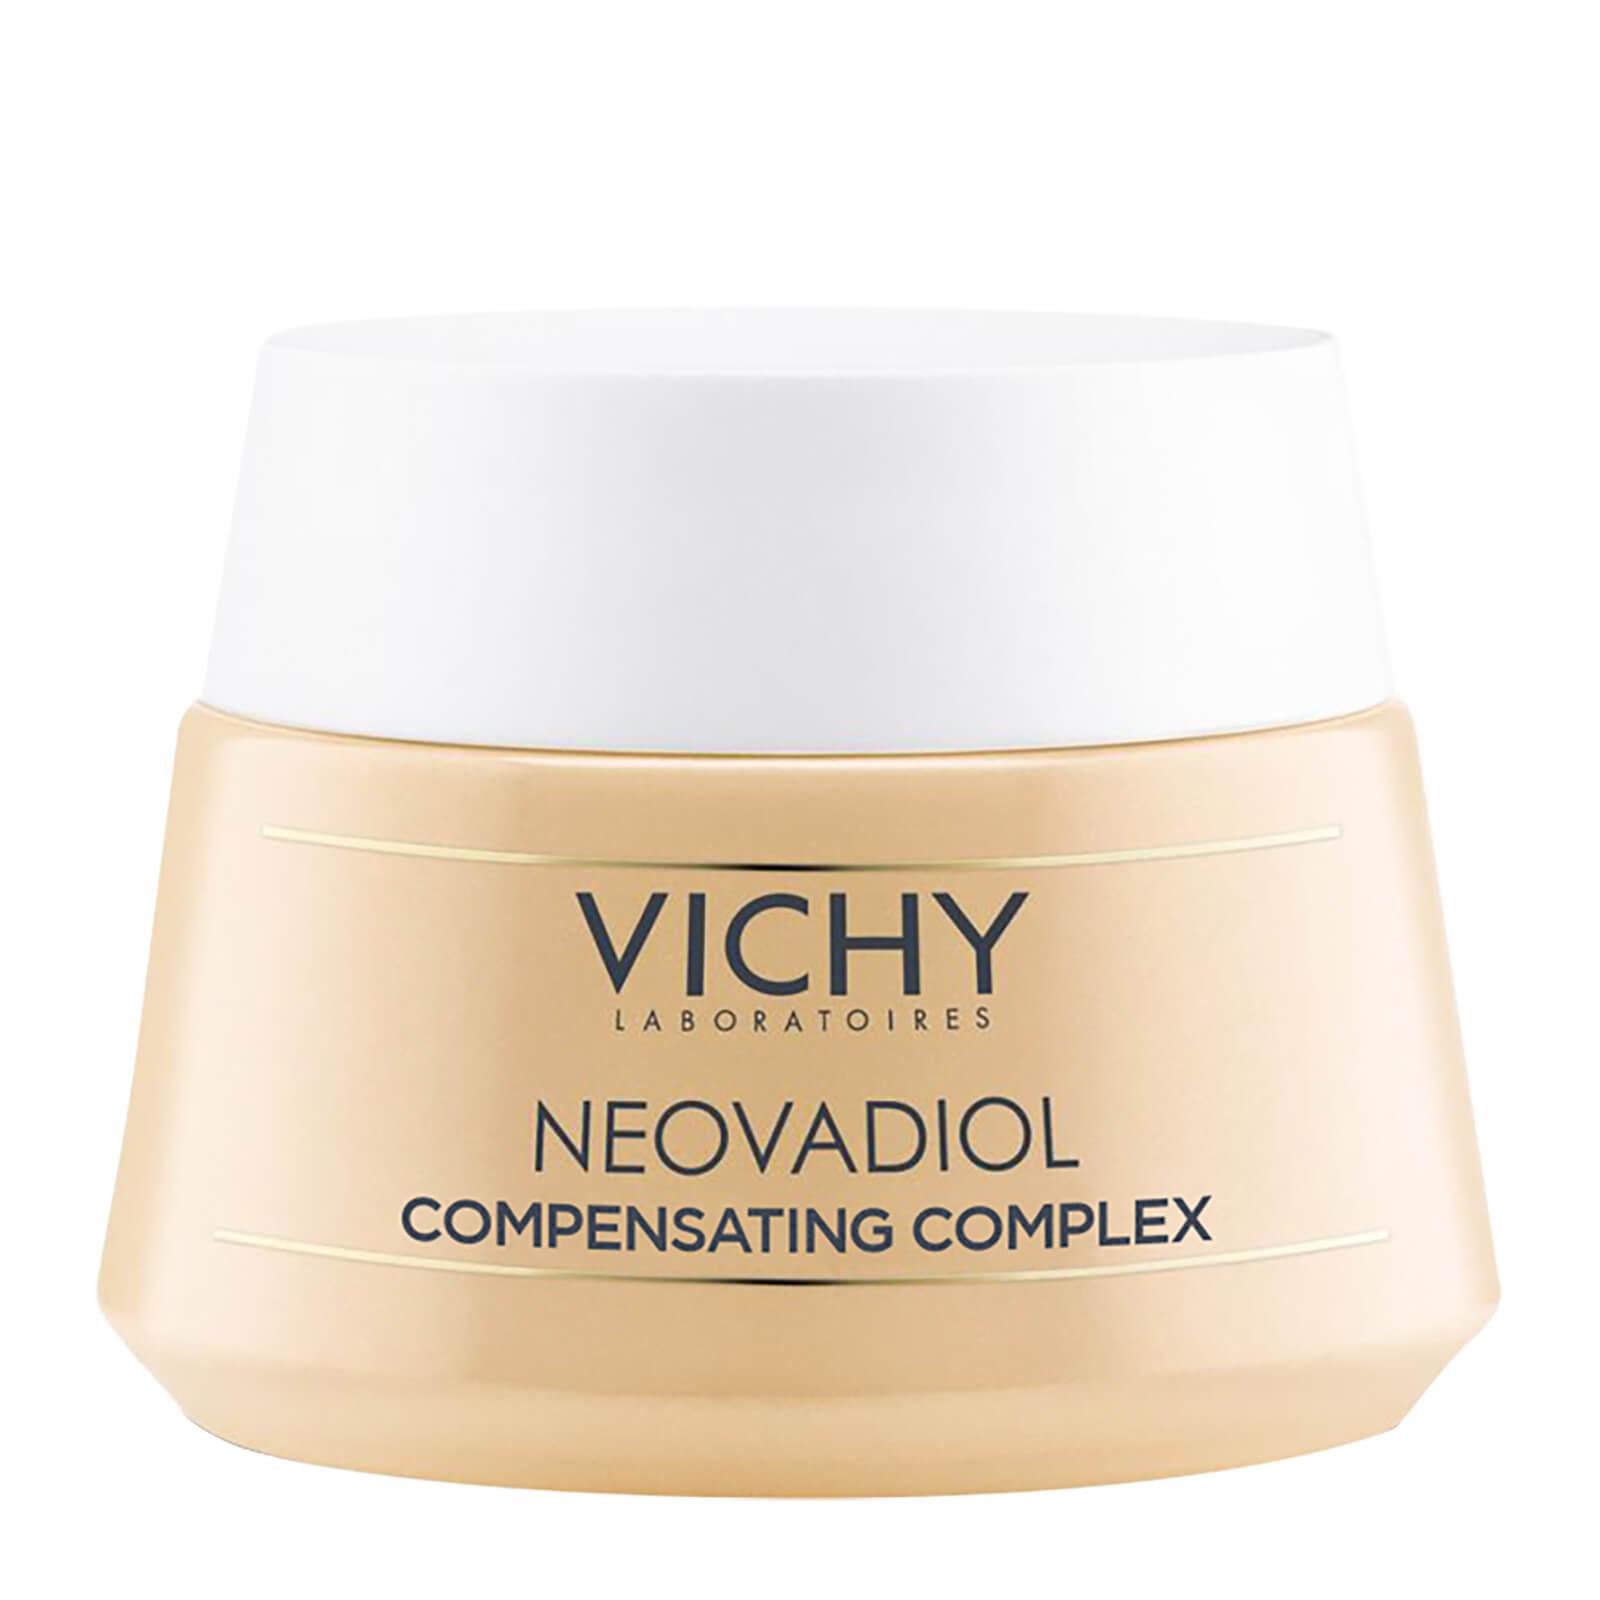 Vichy Crème Anti-sècheresse Vichyde Jour Teint CompensateurNeovadiol 50 ml